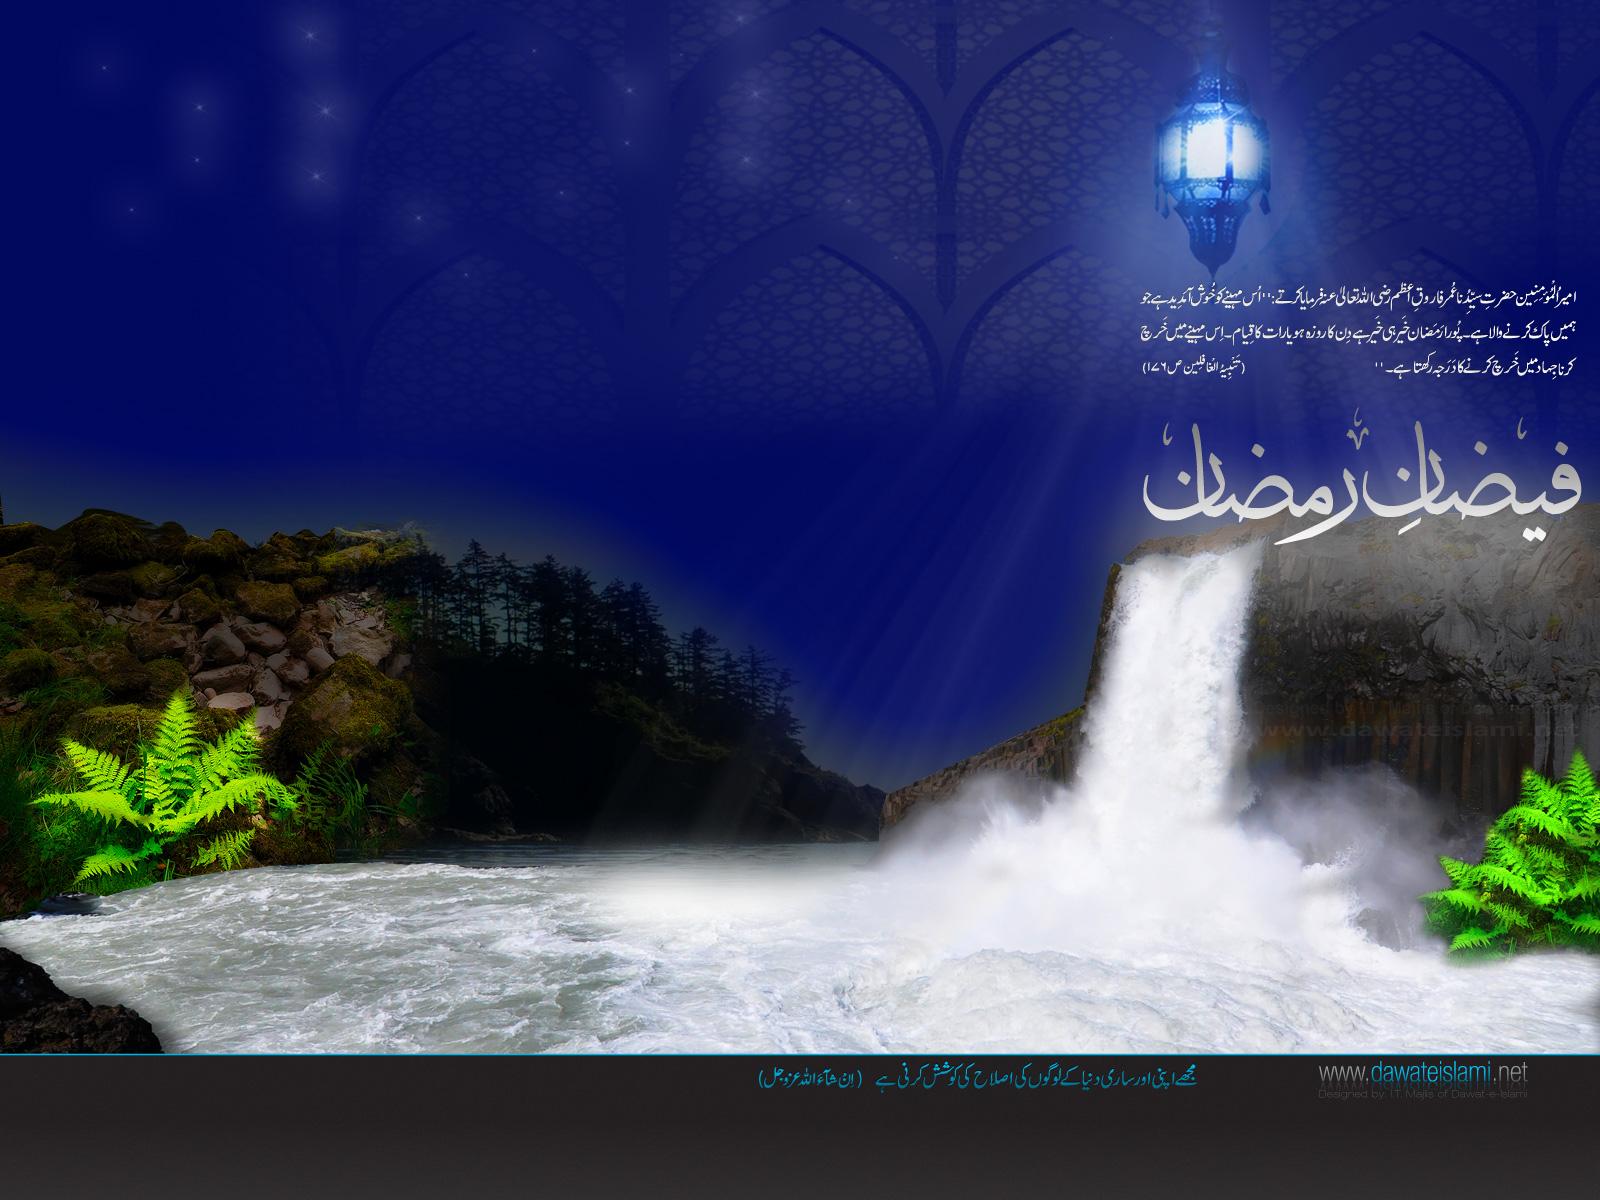 http://4.bp.blogspot.com/-zATWAPYhubc/T_ykxFjPlFI/AAAAAAAAAUY/AhbAYxv4Rr4/s1600/ramadan+kareem_wallpapers_by_dawateislami_7.jpg